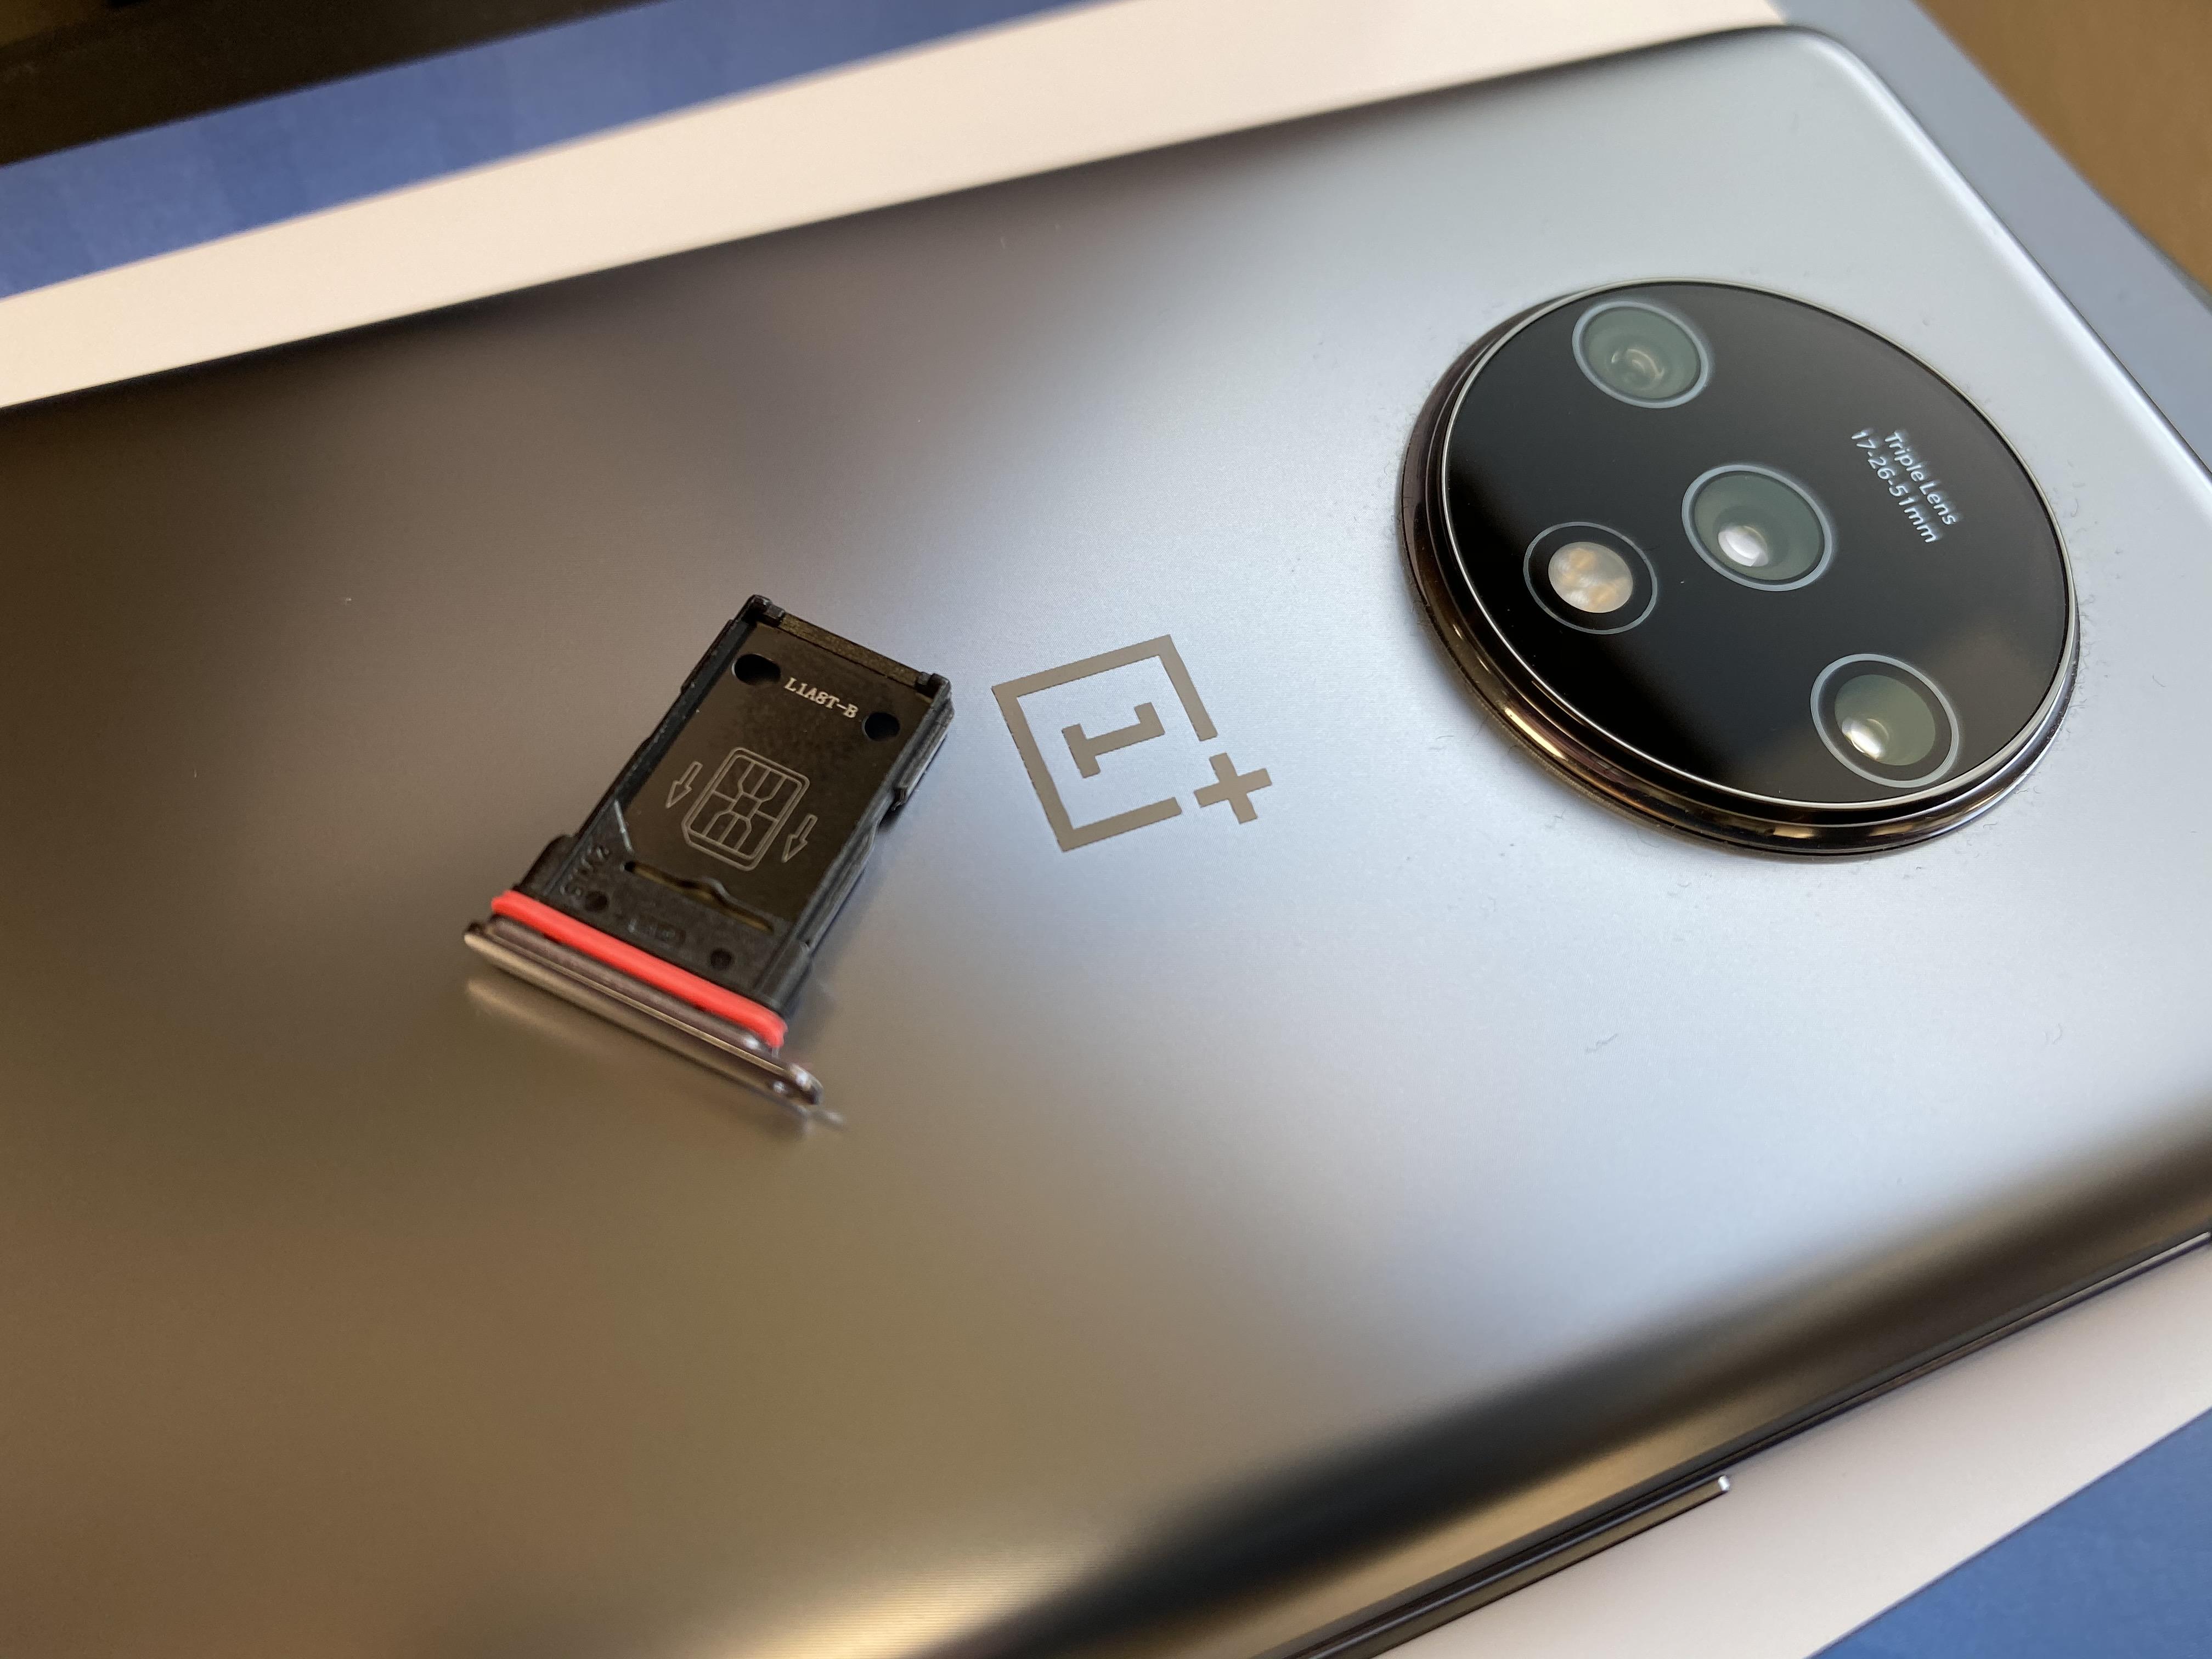 OnePlus-7T-Dual-SIM.jpg